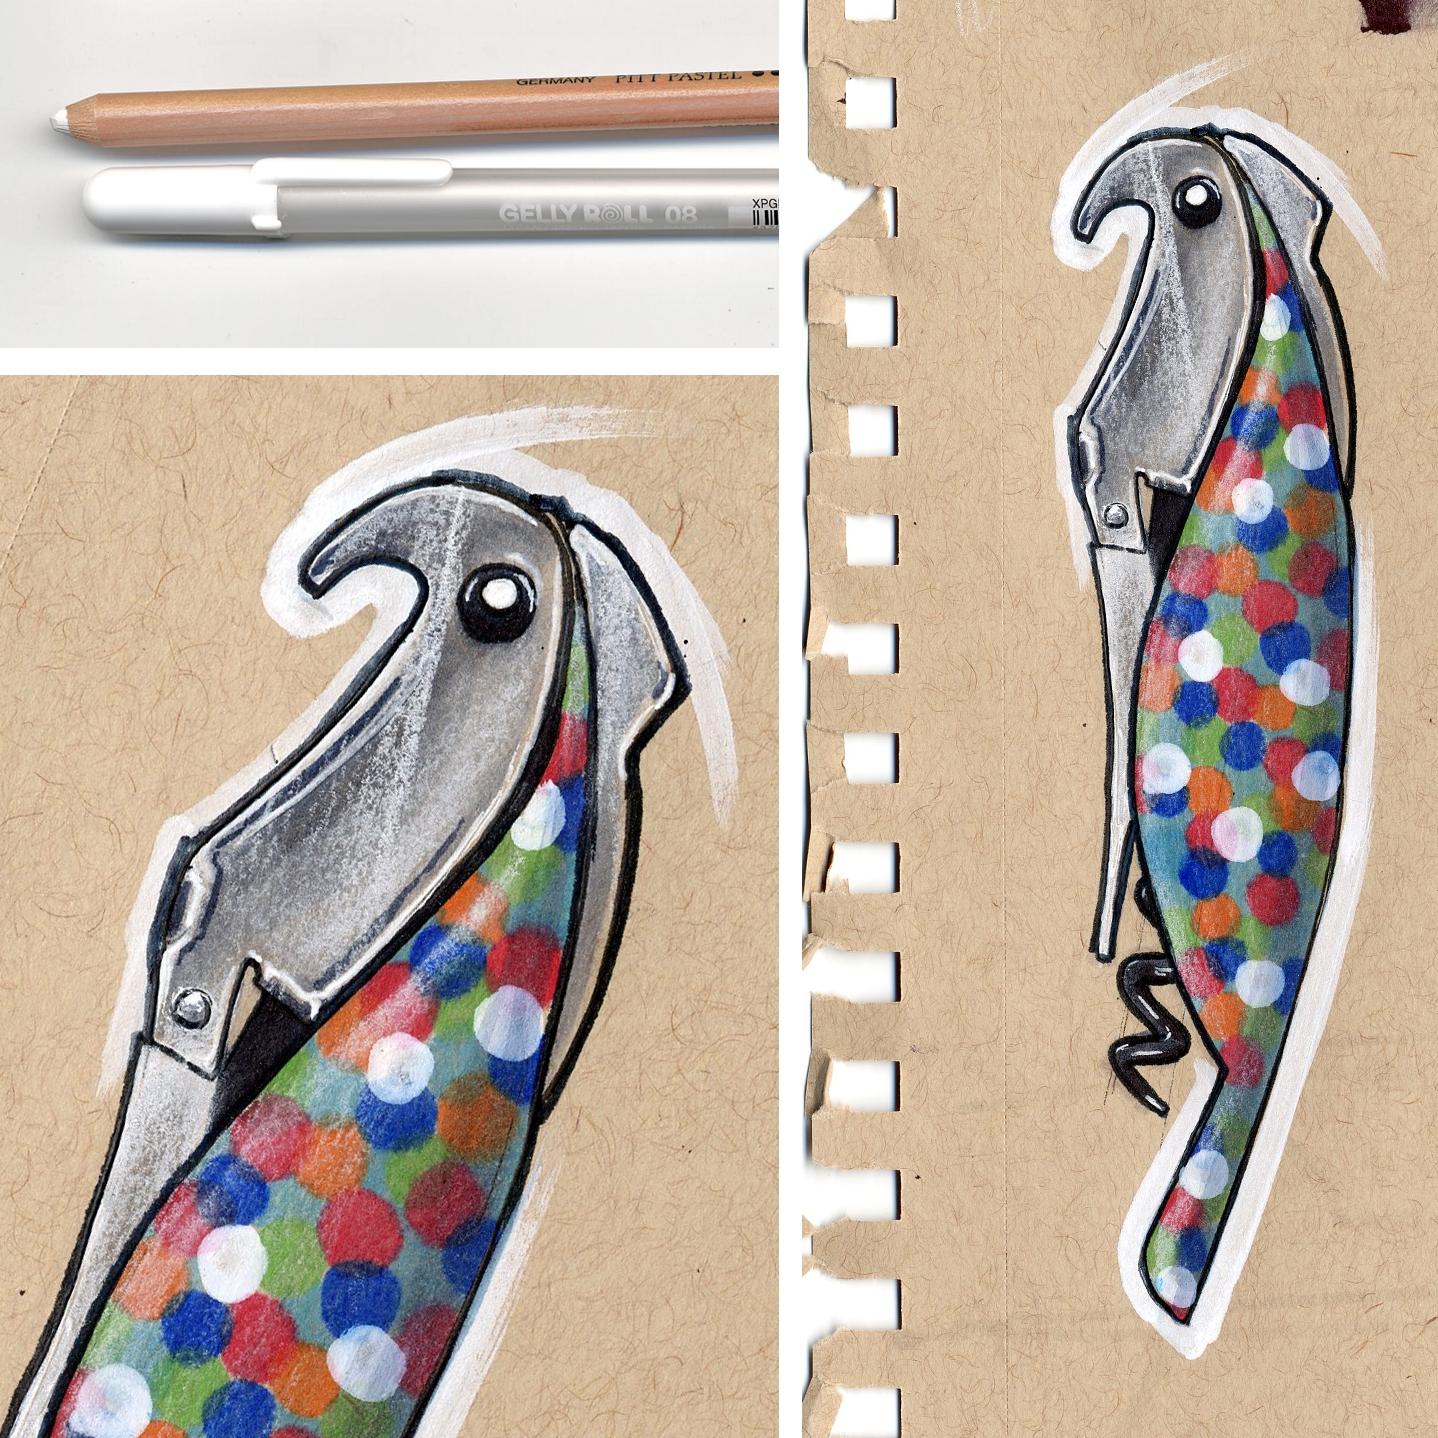 Alessi Parrot Corkscrew - Proust.Marker, pen and pencil.